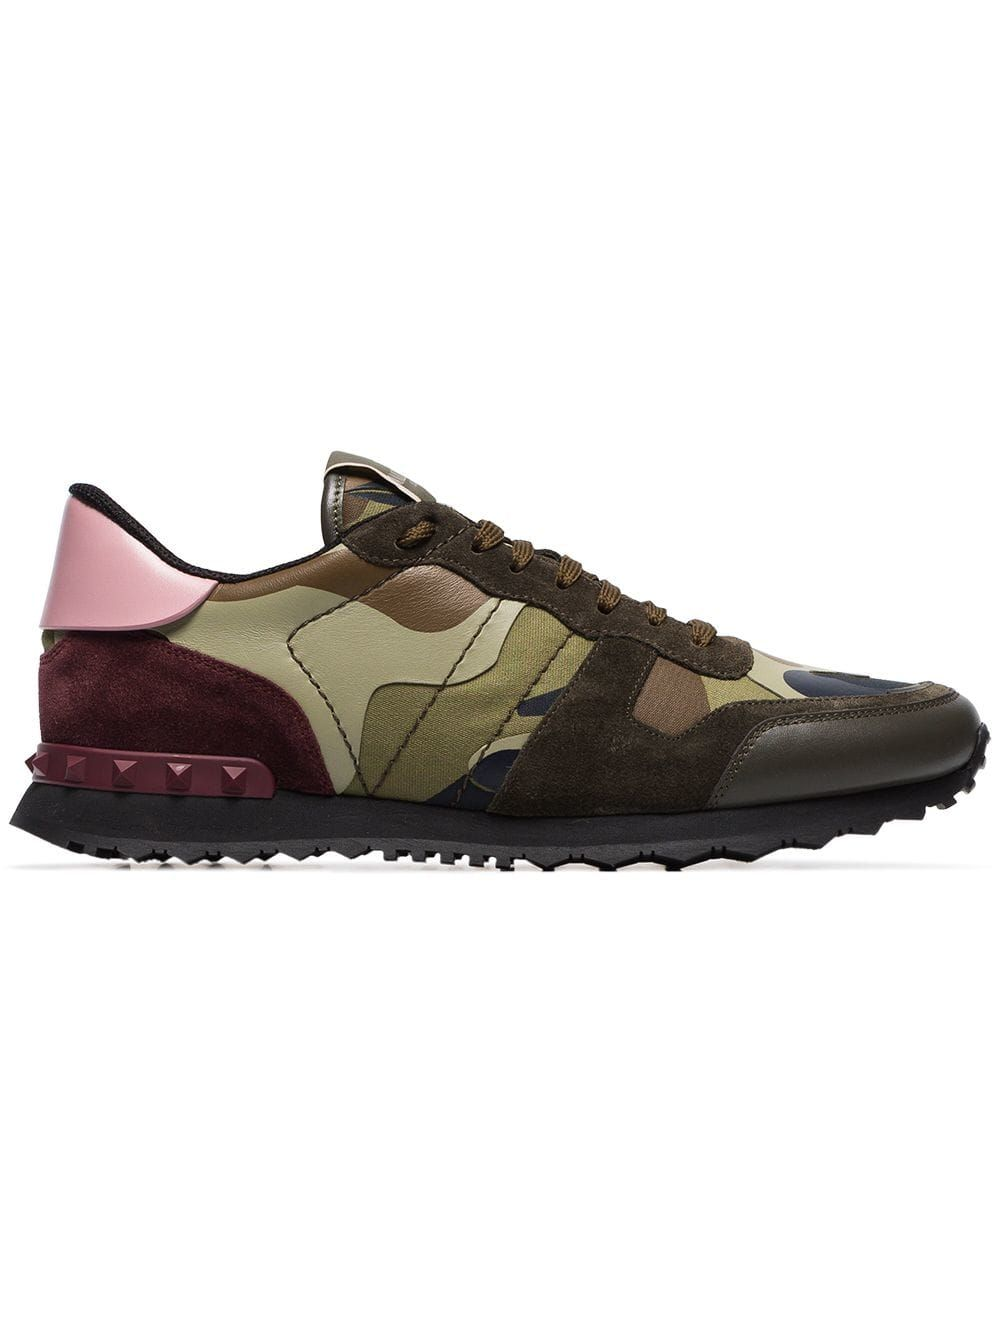 d95029e1966ef VALENTINO VALENTINO VALENTINO GARAVANI ROCKRUNNER SNEAKERS - GREEN. # valentino #shoes